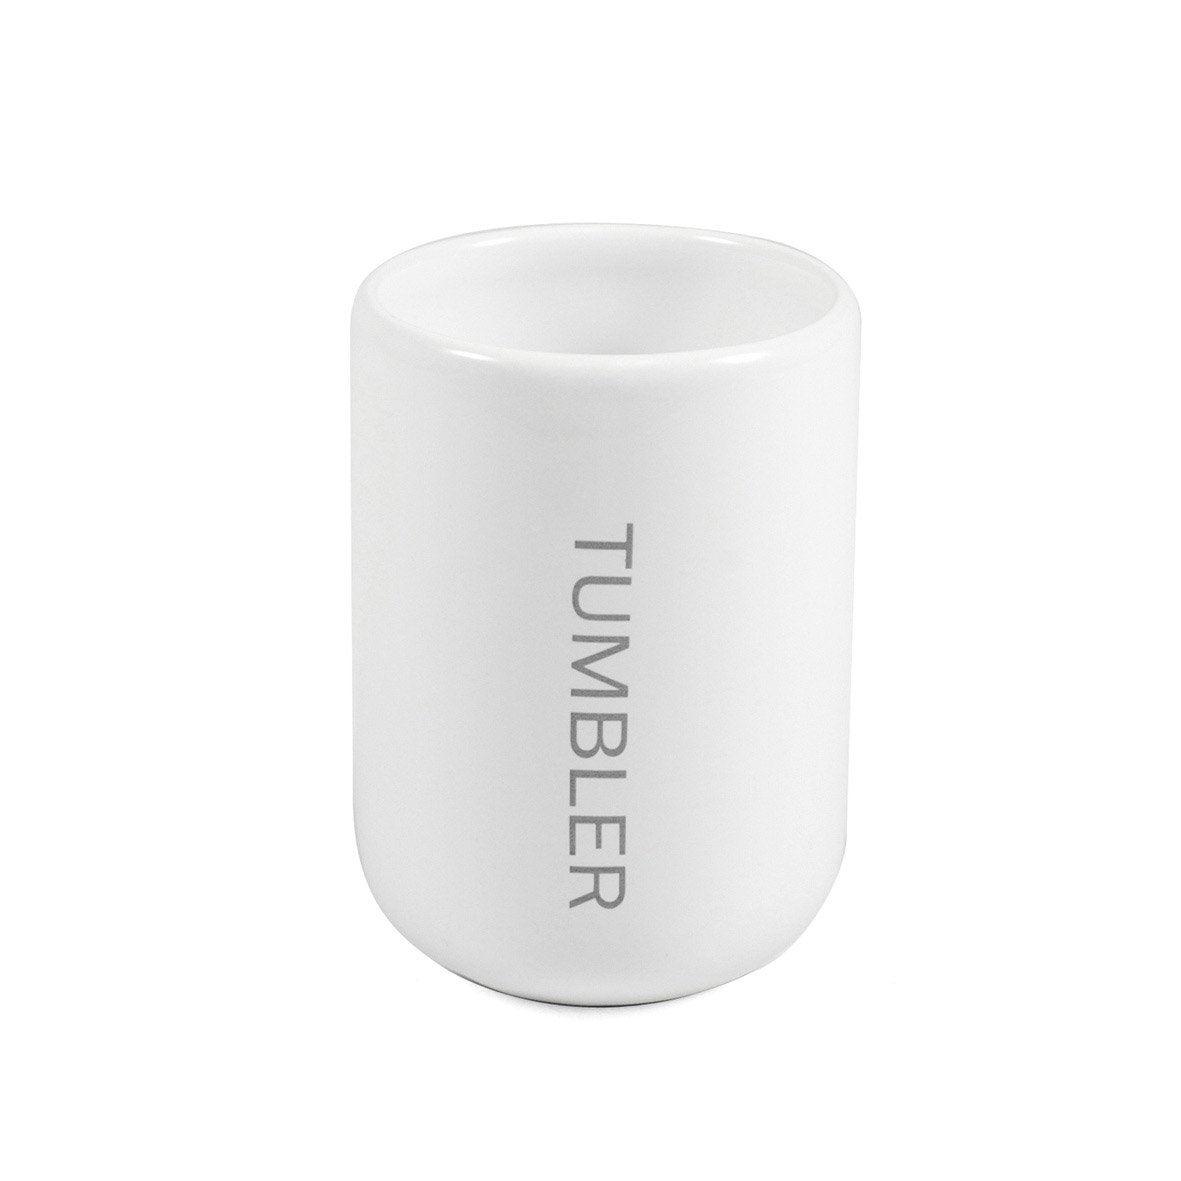 Gobelet céramique Oslo, blanc-blanc 0